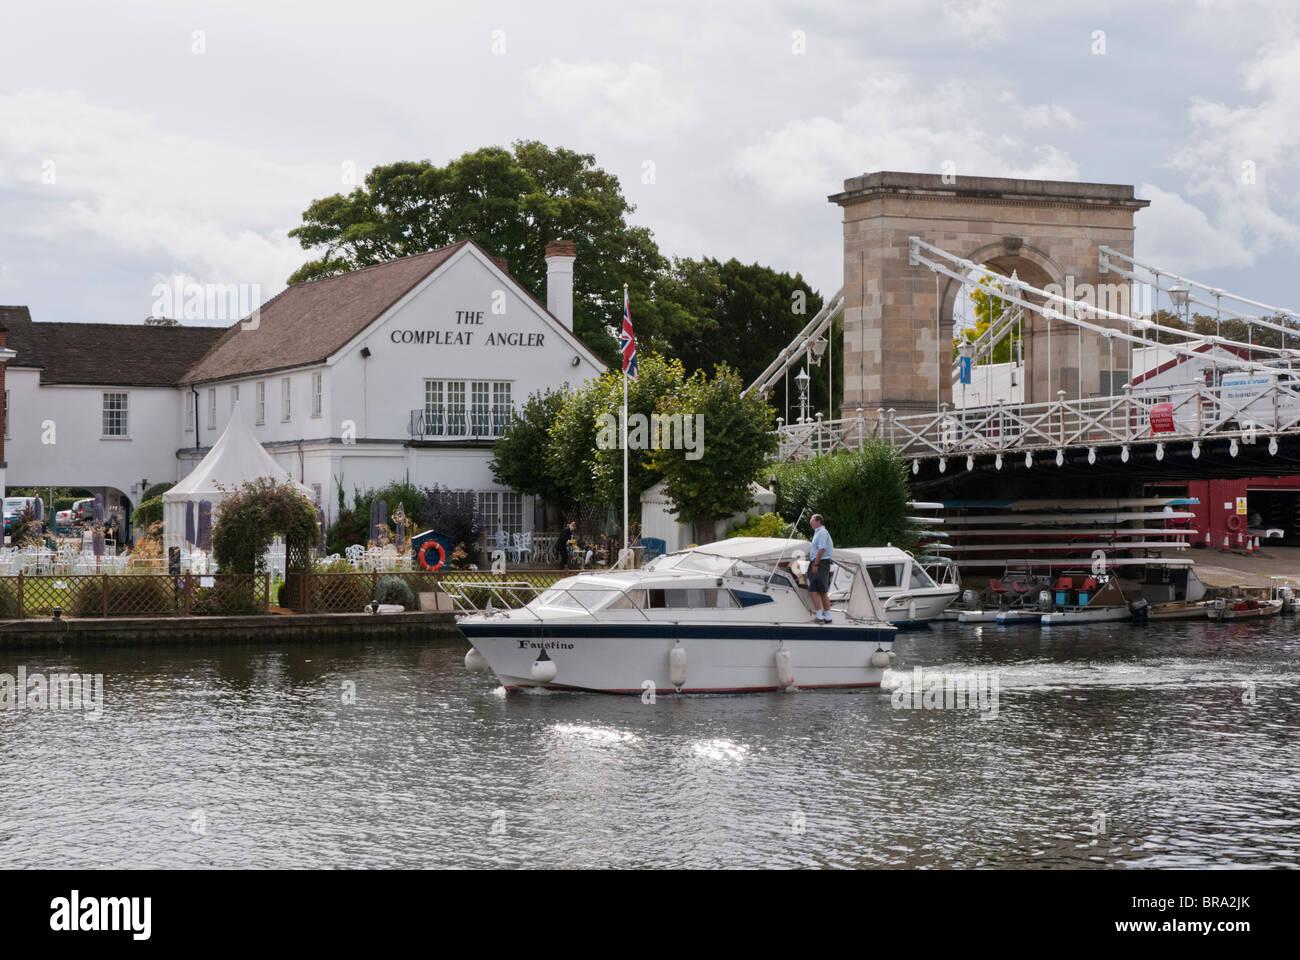 Compleat Angler Hotel In Marlow Buckinghamshire Uk